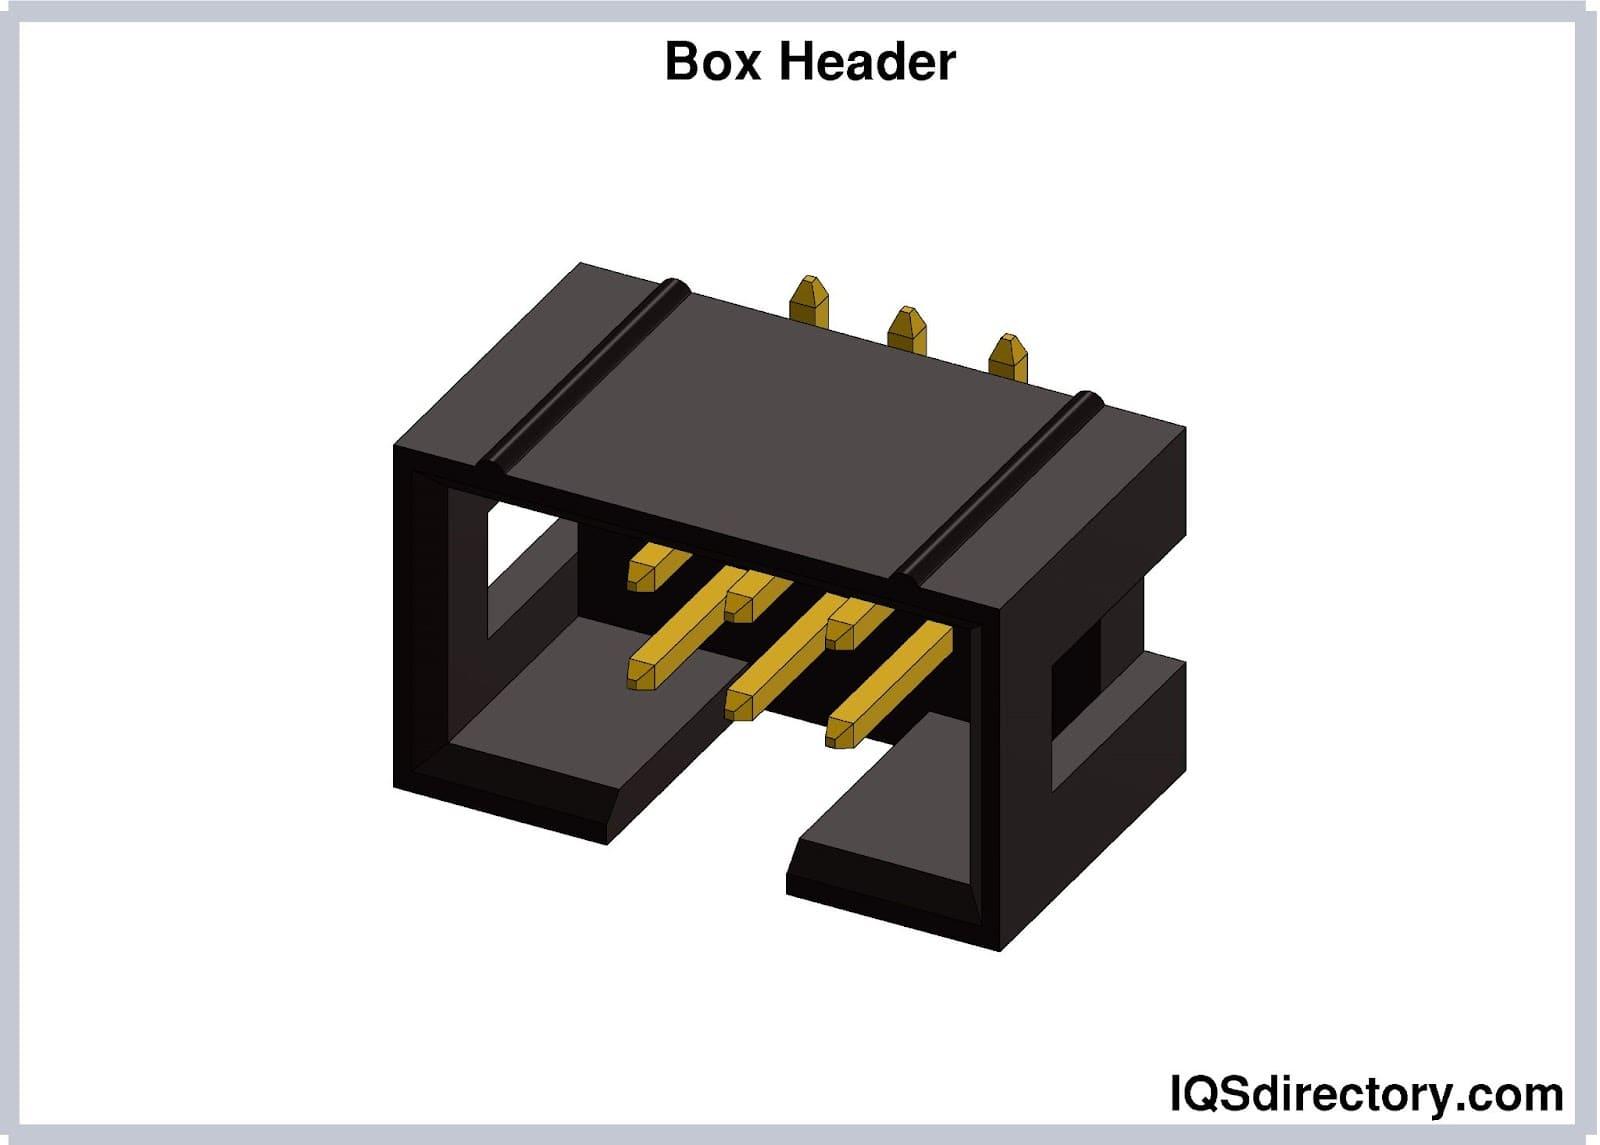 Box Header